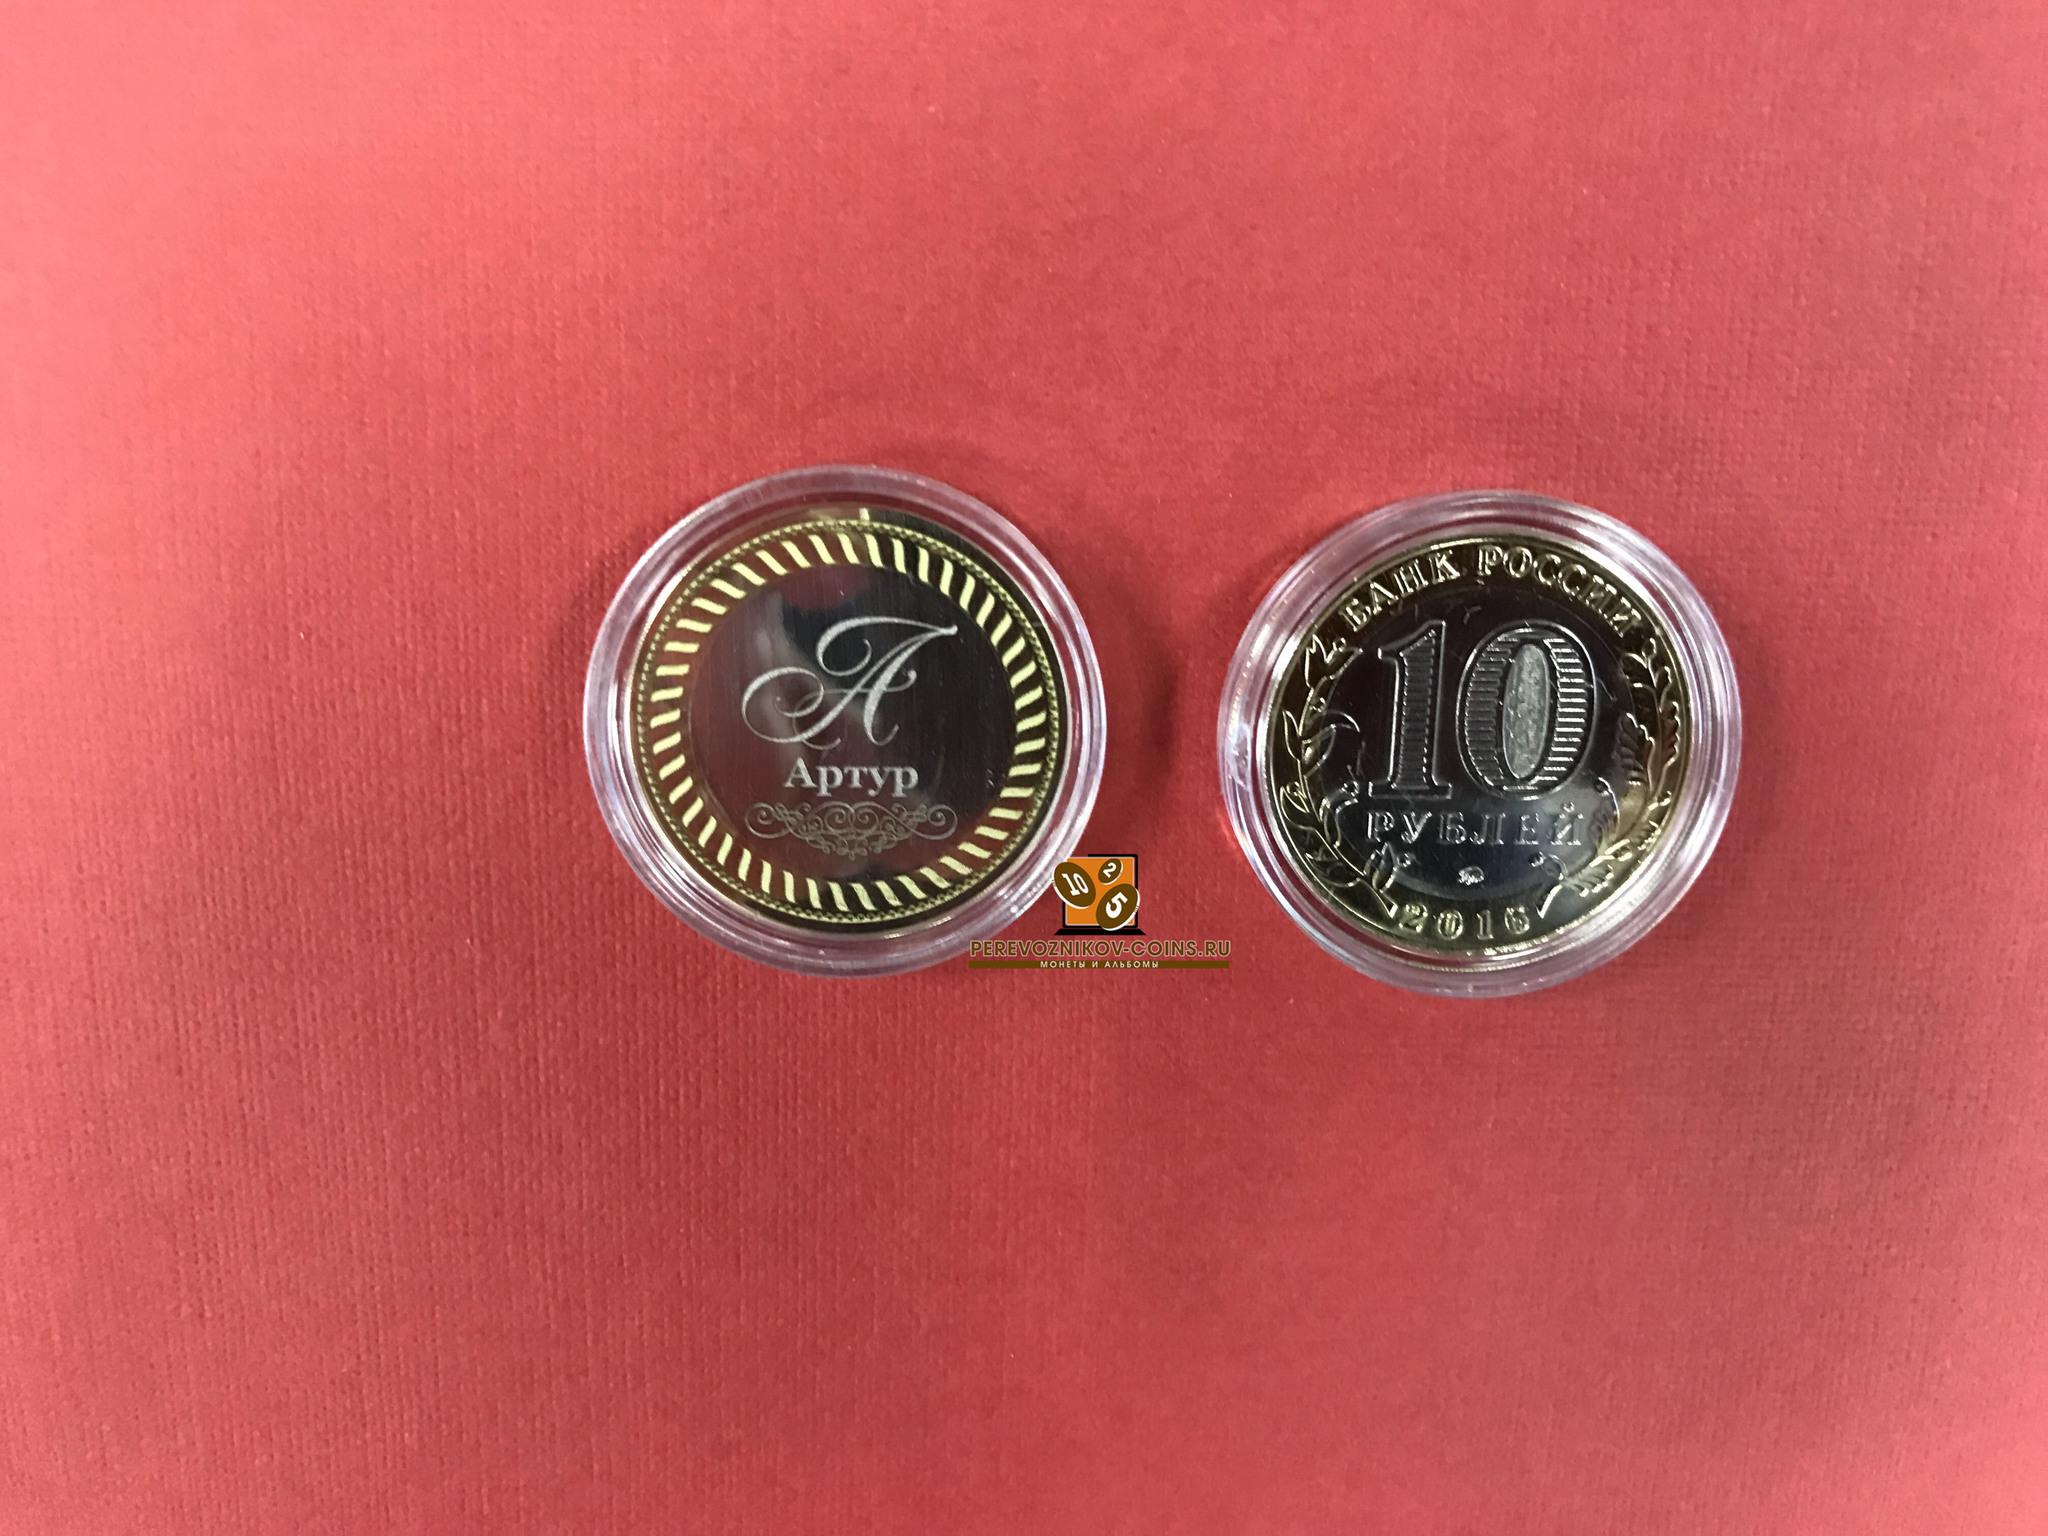 Артур. Гравированная монета 10 рублей